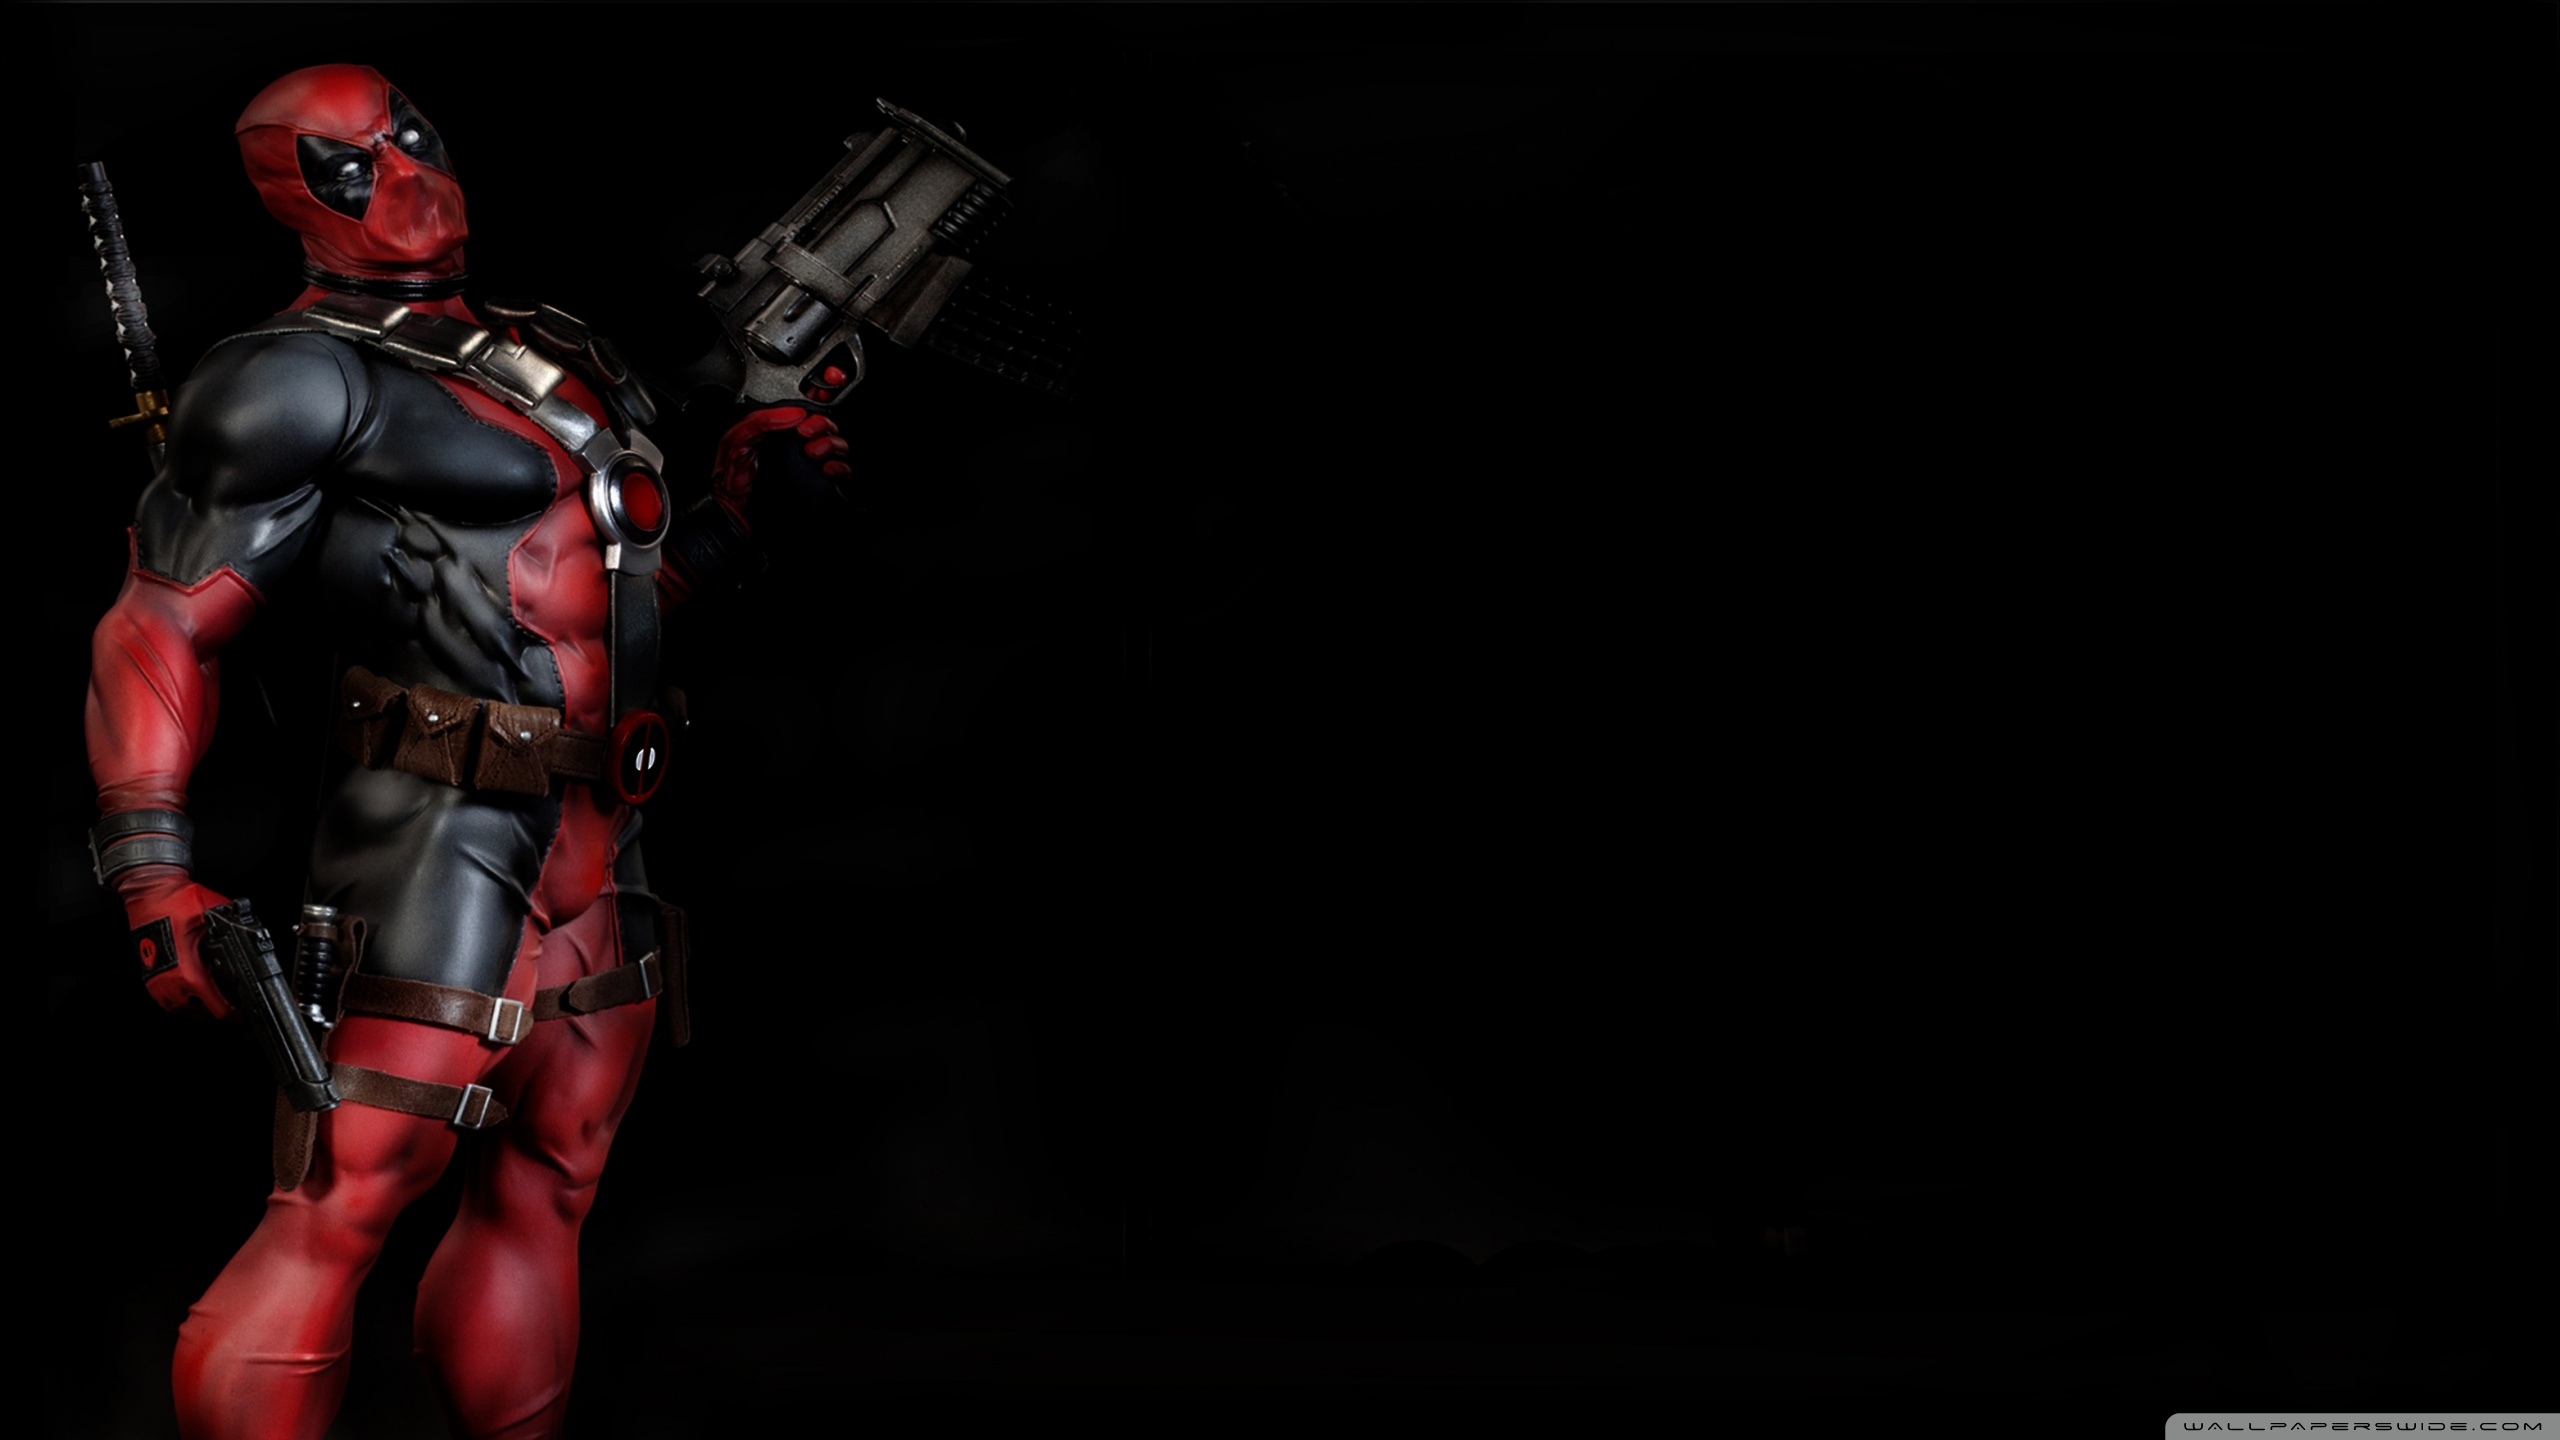 Deadpool The Video Game Hd Wallpaper Wallpaperlists Com